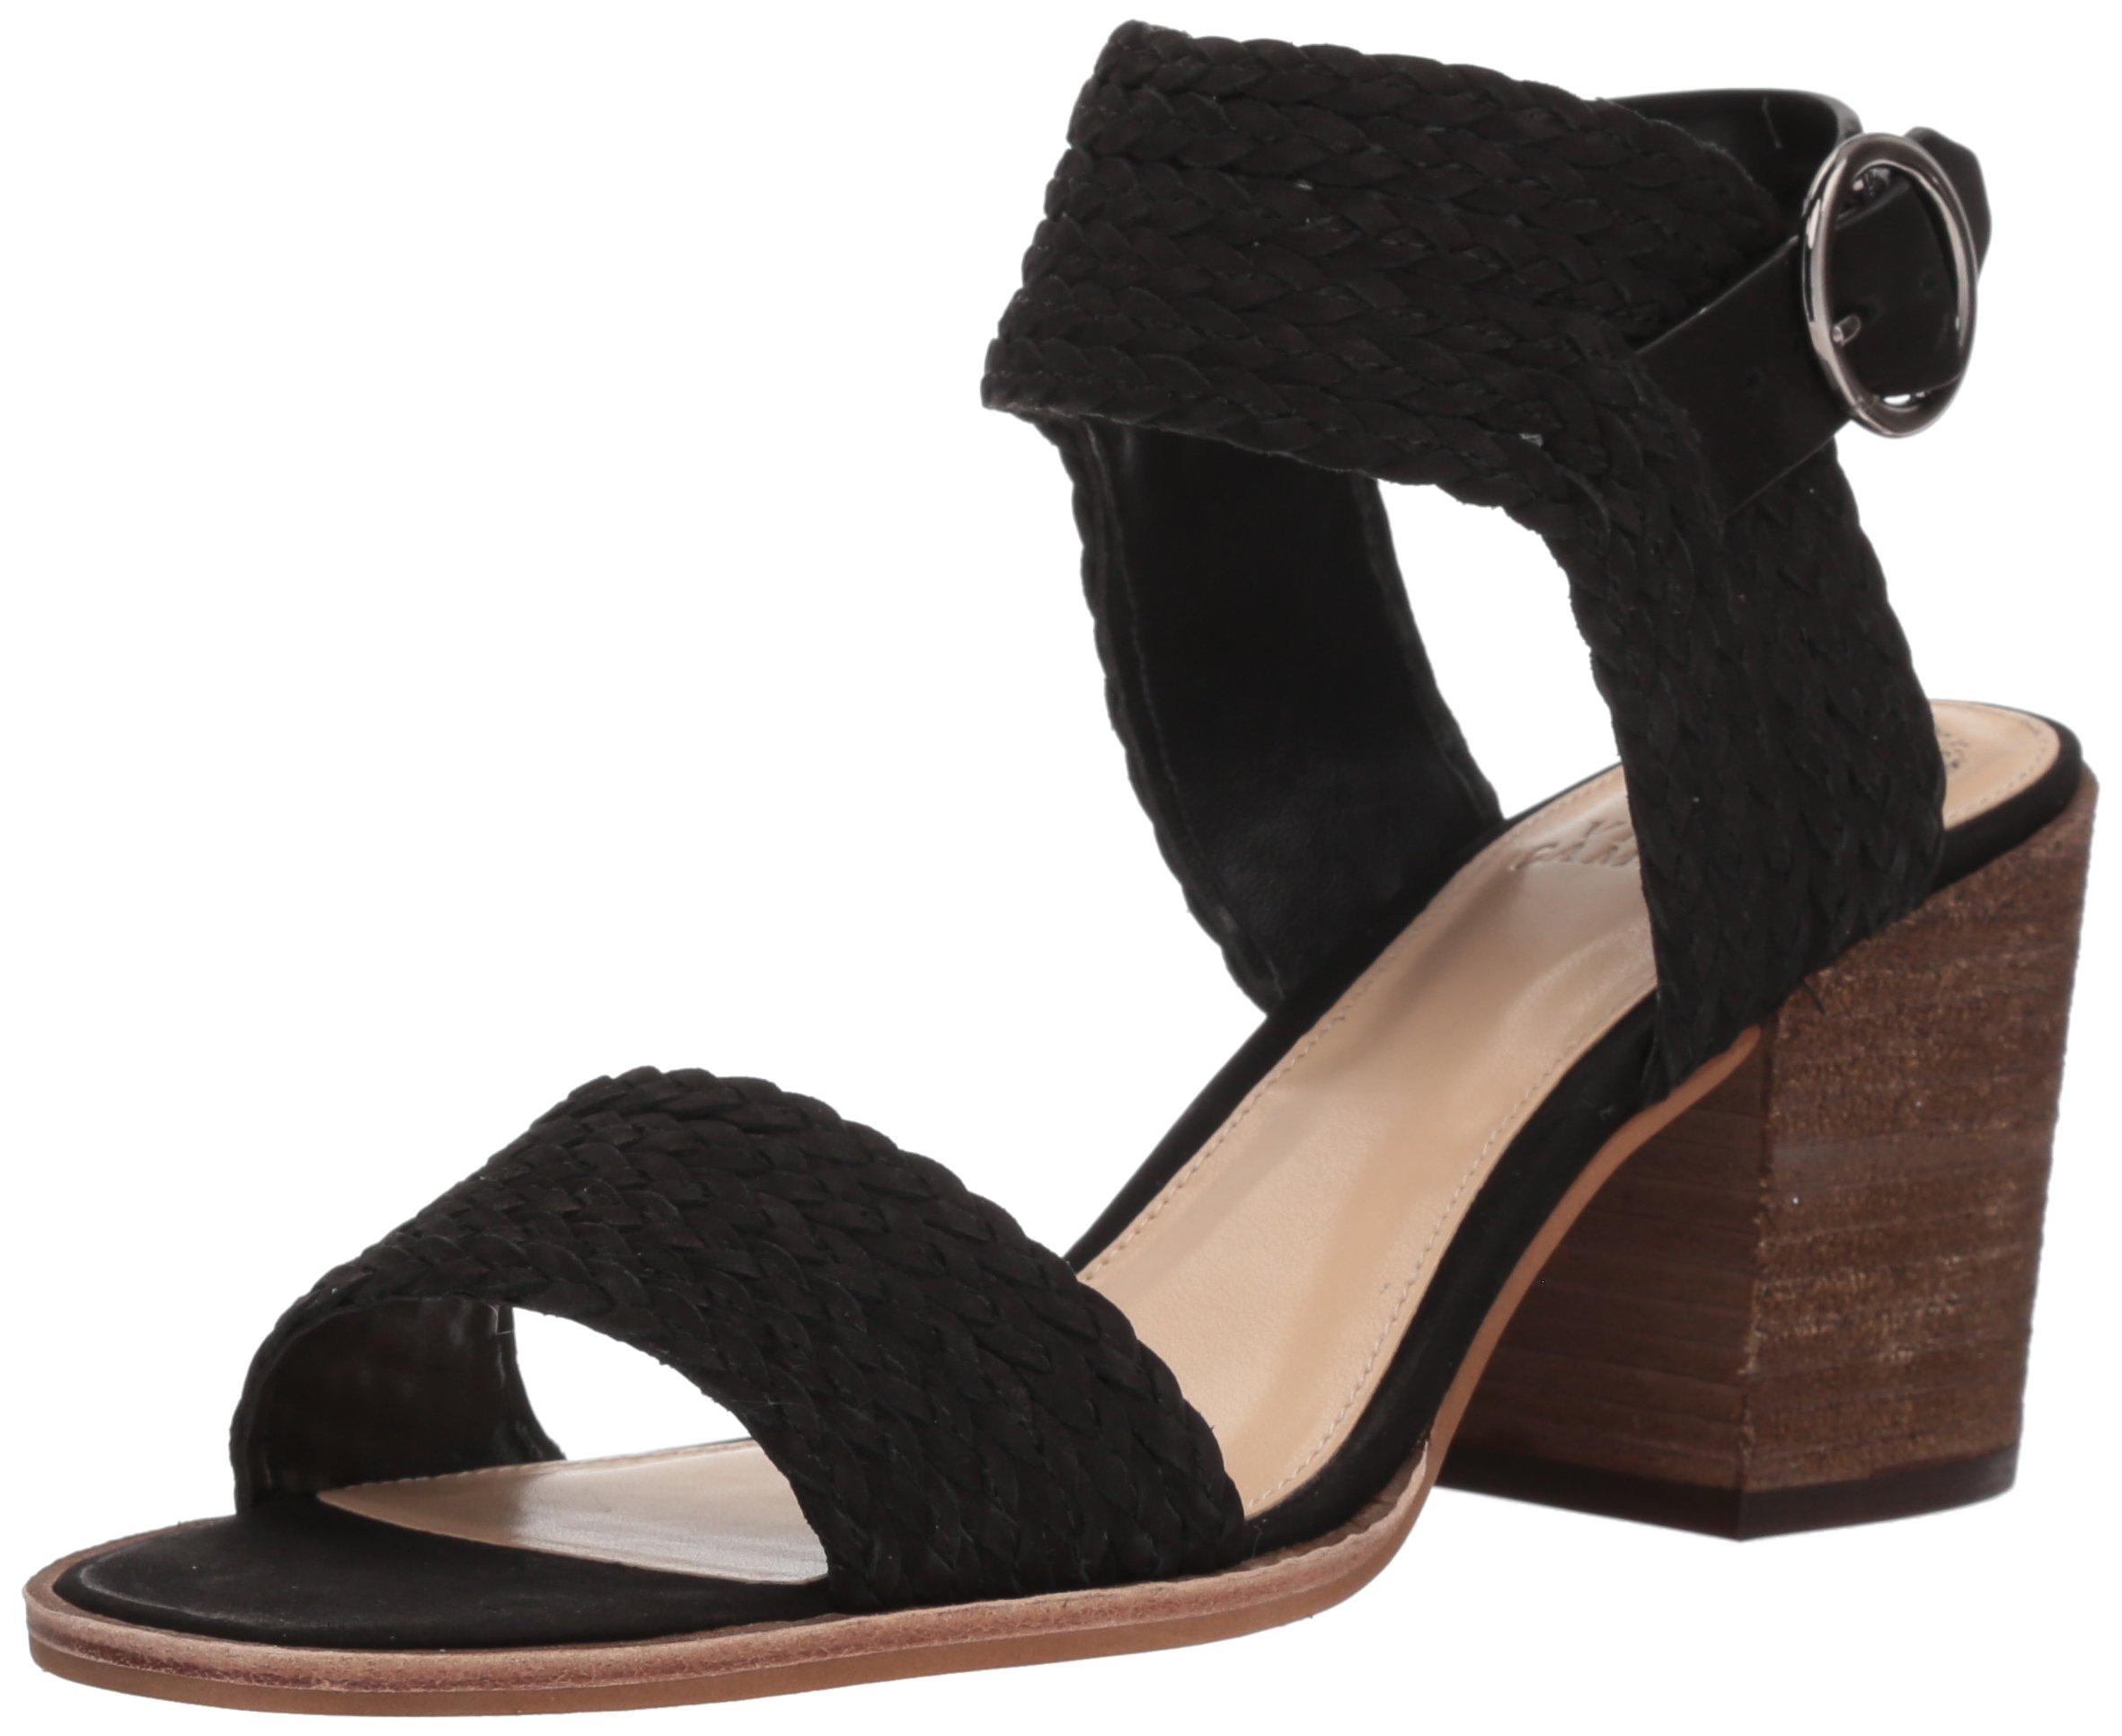 Vince Camuto Women's Kolema Heeled Sandal, Black, 6 Medium US